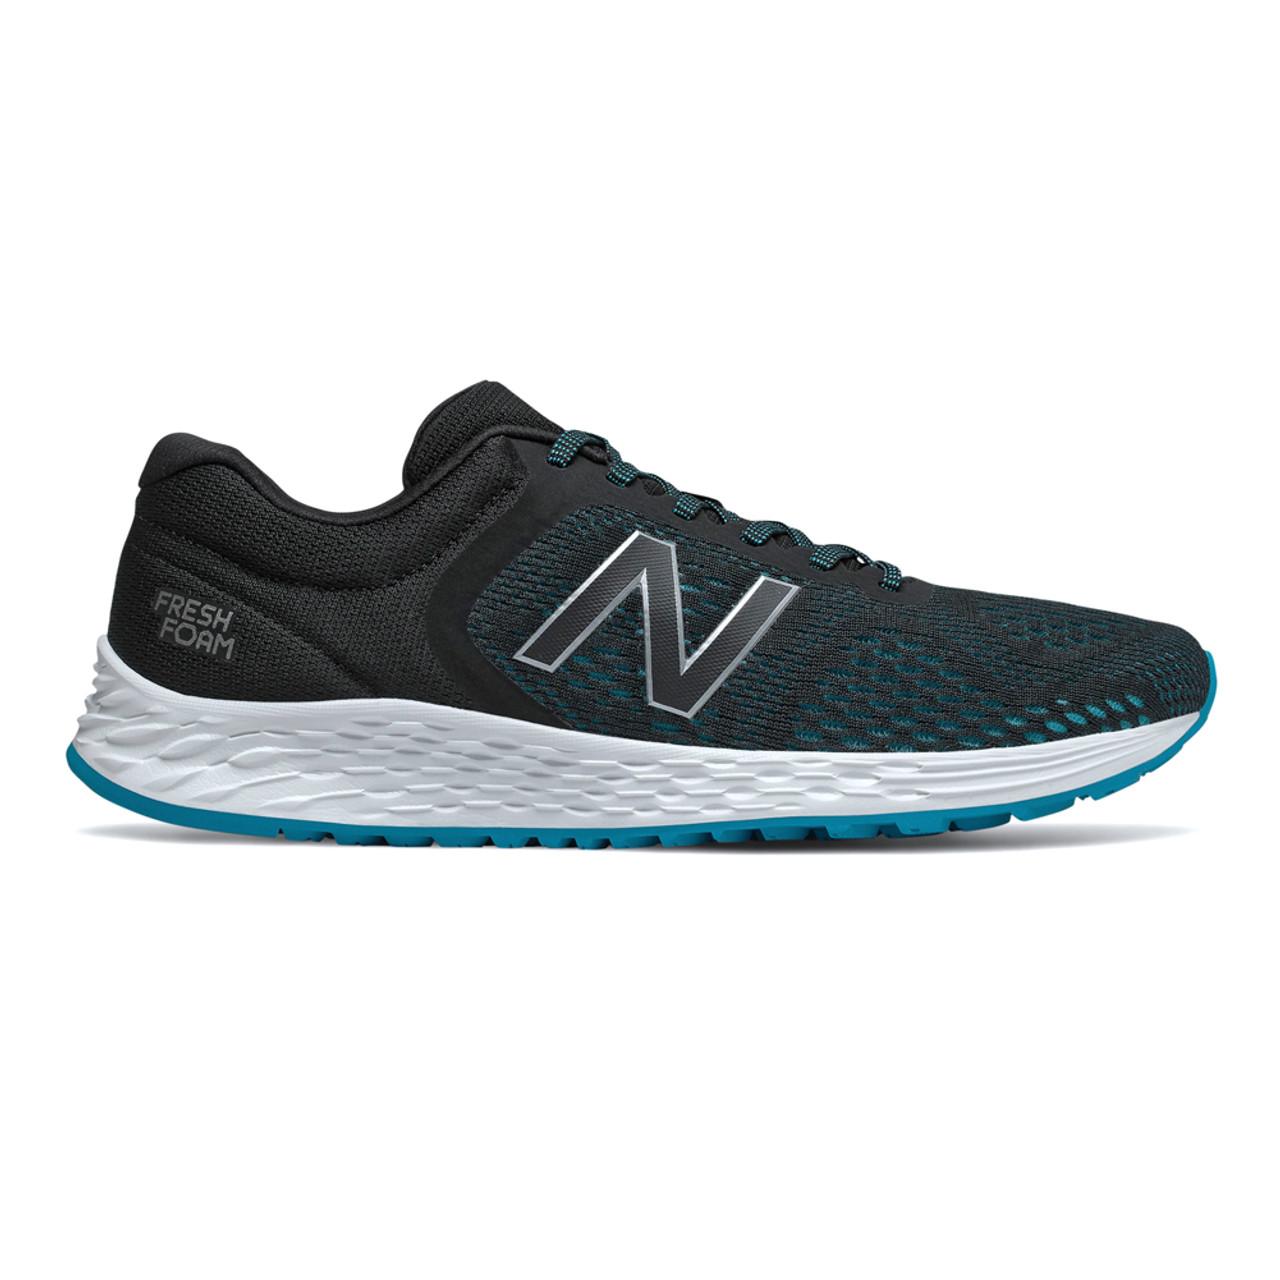 New Balance Men's MARISCT2 Running Shoe